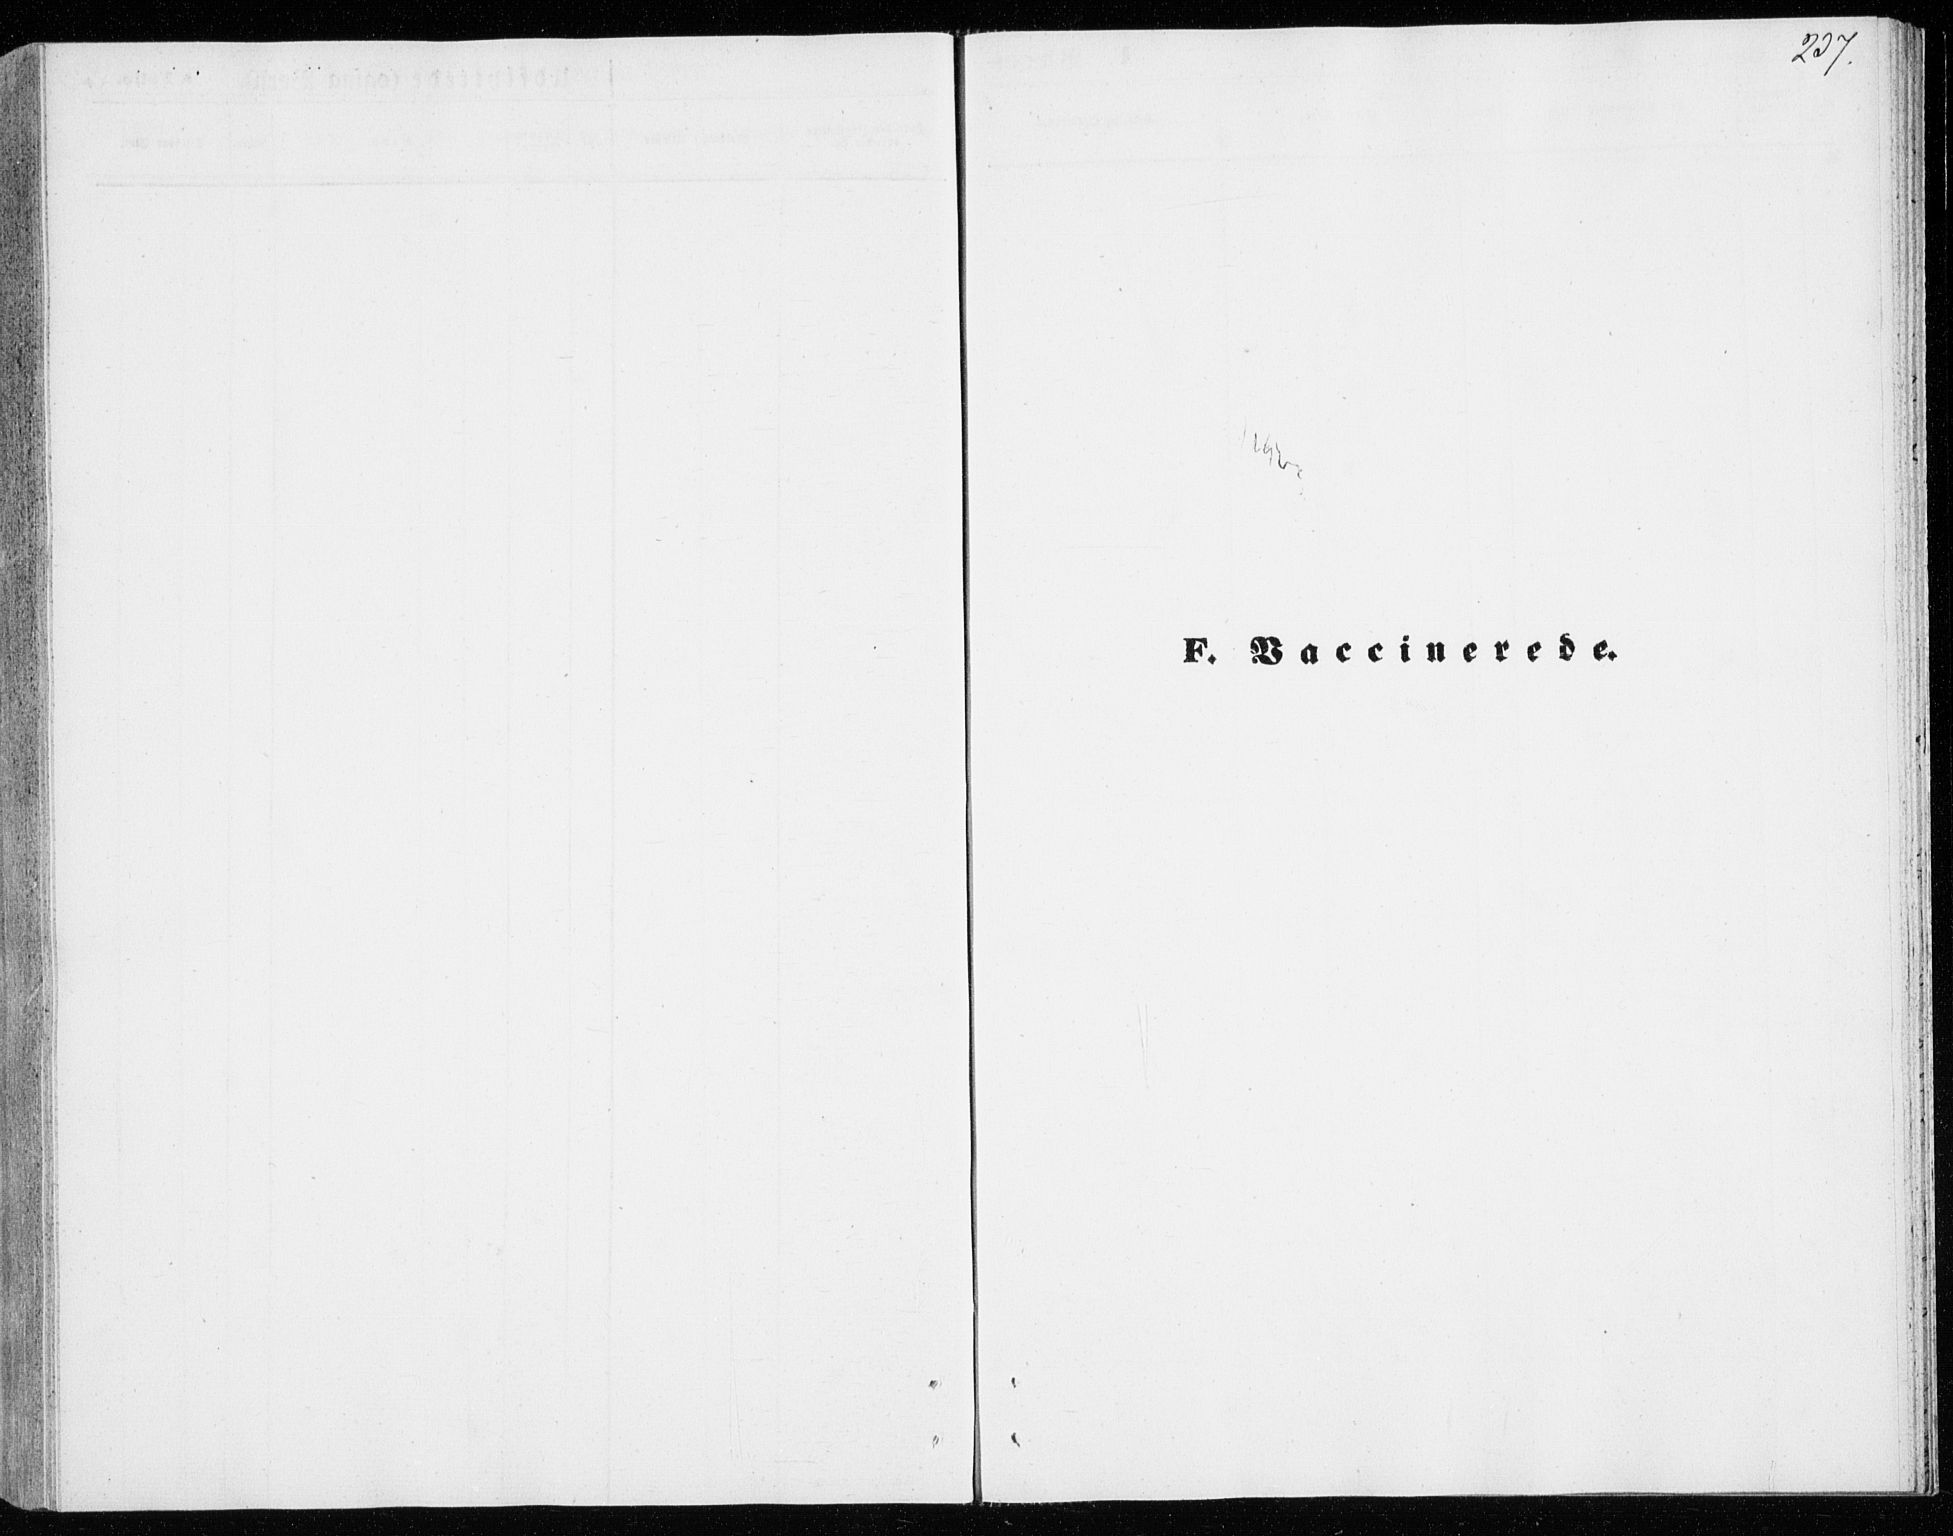 SATØ, Lenvik sokneprestembete, H/Ha: Ministerialbok nr. 9, 1866-1873, s. 237